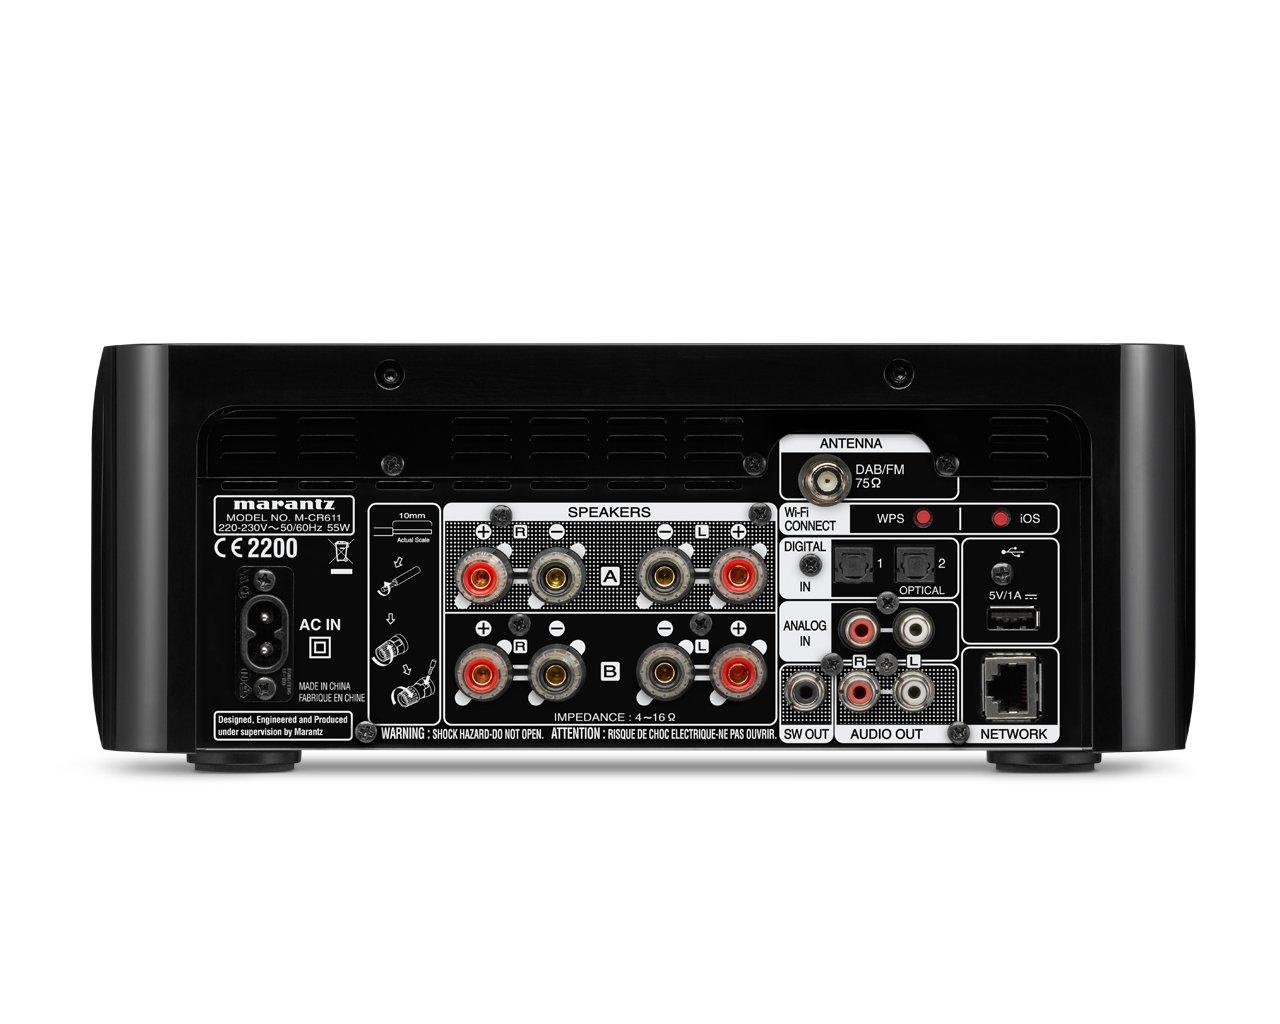 61QmPkJH 0L - Marantz M-CR611 Melody Media Network CD Receiver with DAB/DAB+ - Black